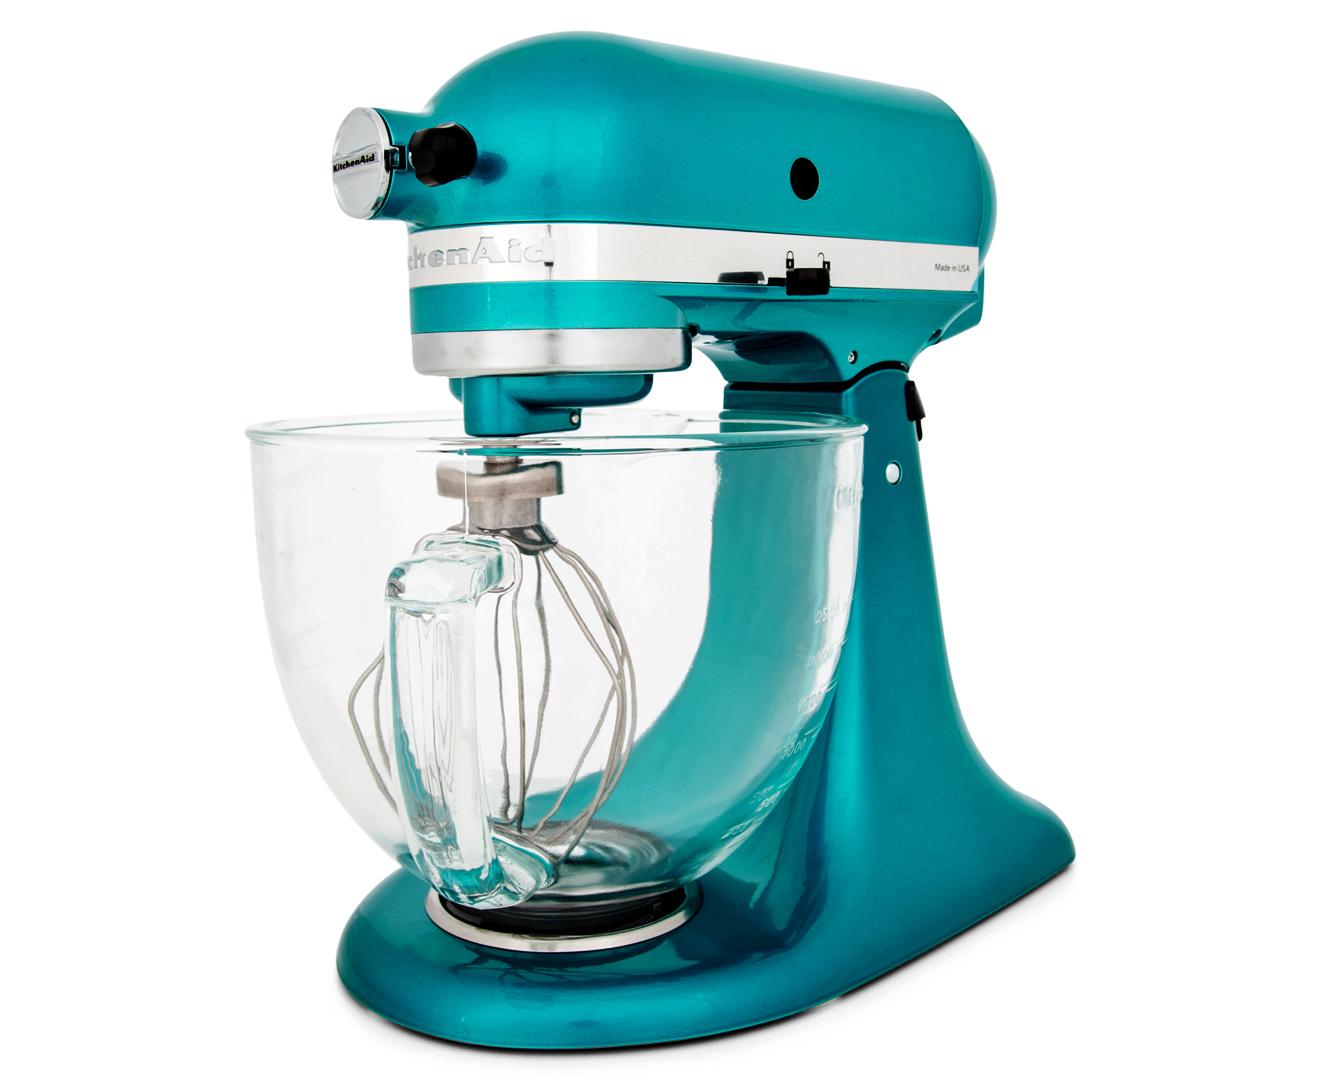 KitchenAid KSM155 Artisan Stand Mixer - Sea Glass   Catch.com.au